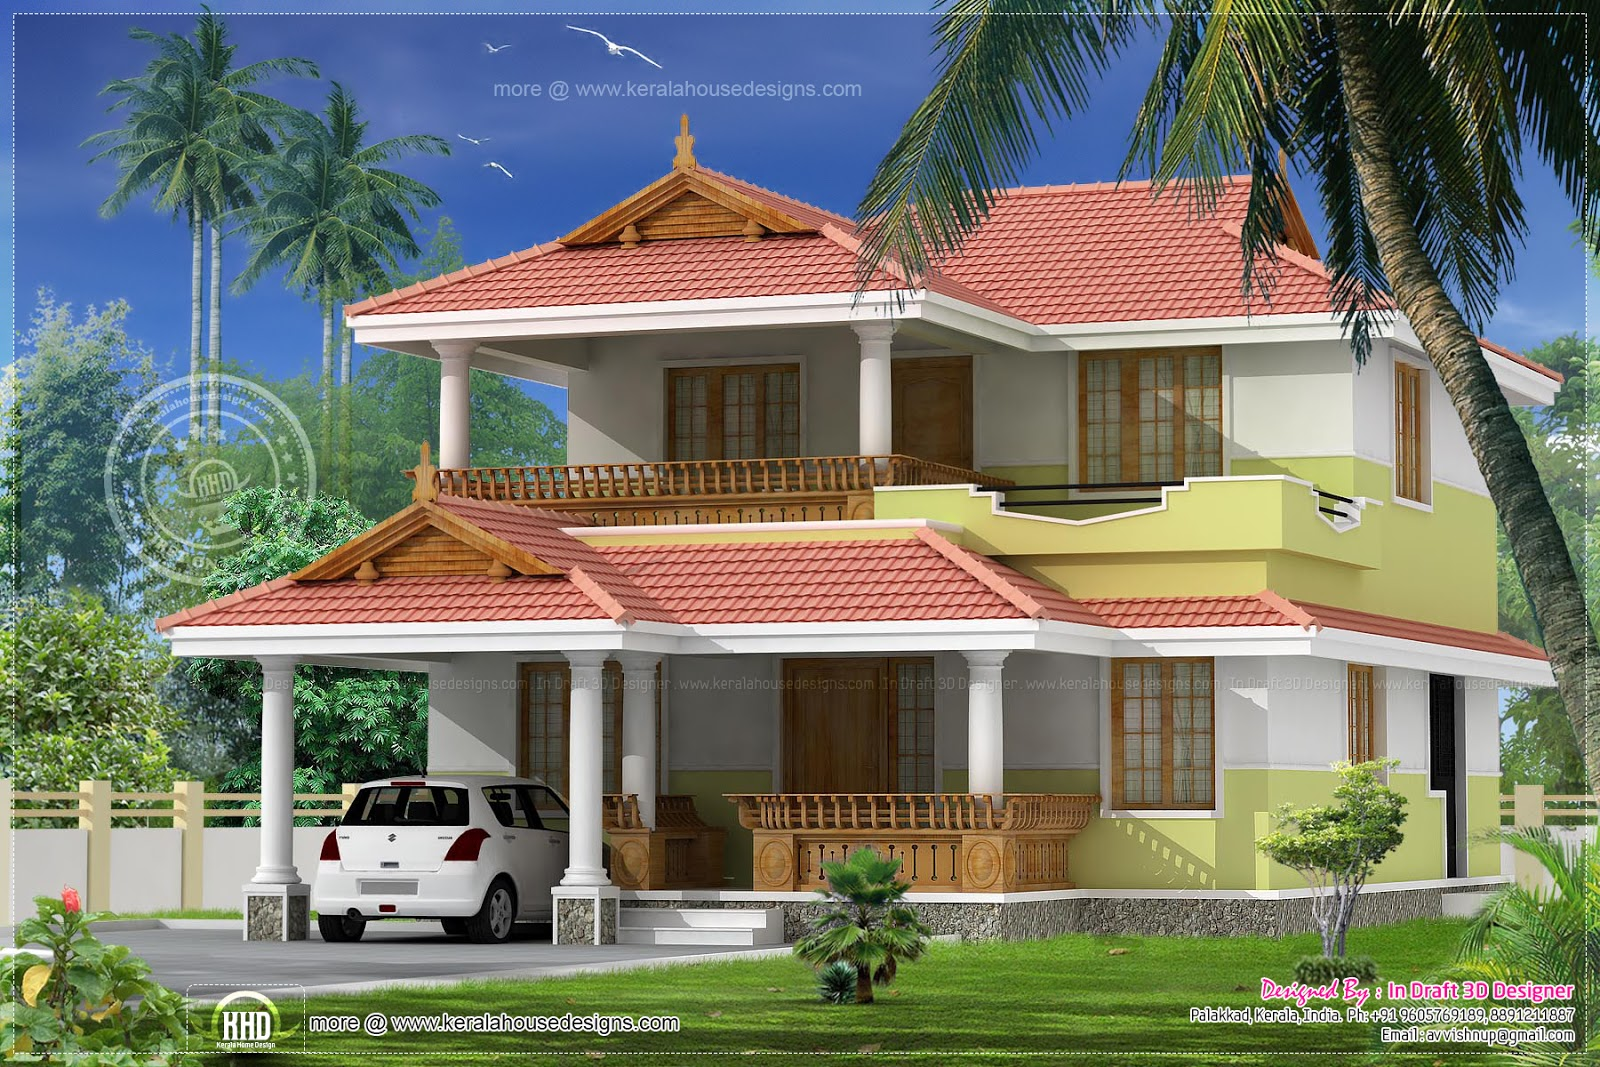 Keralahousedesigns July 2015